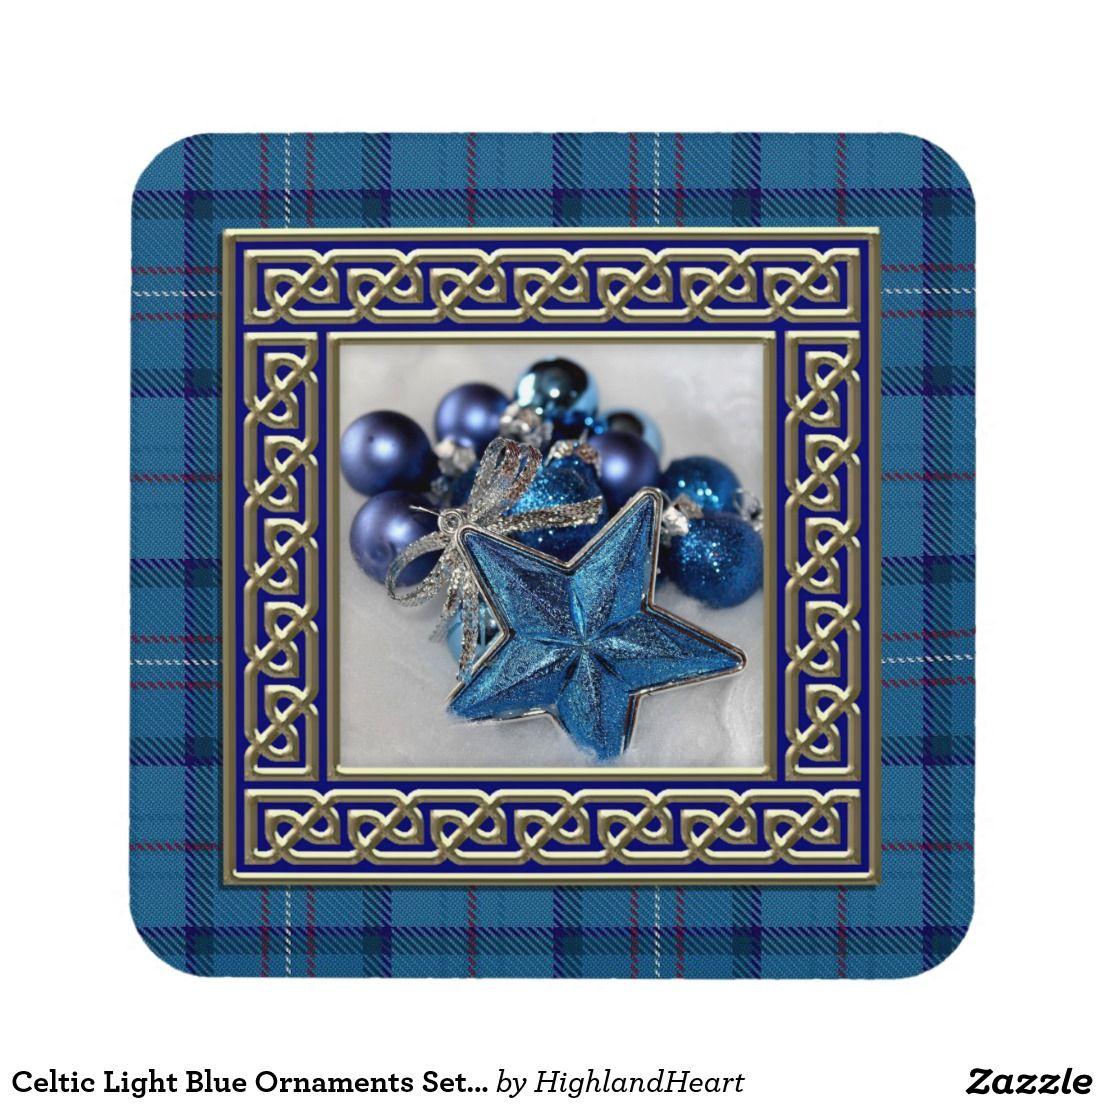 Celtic Light Blue Ornaments Set of 6 Coasters